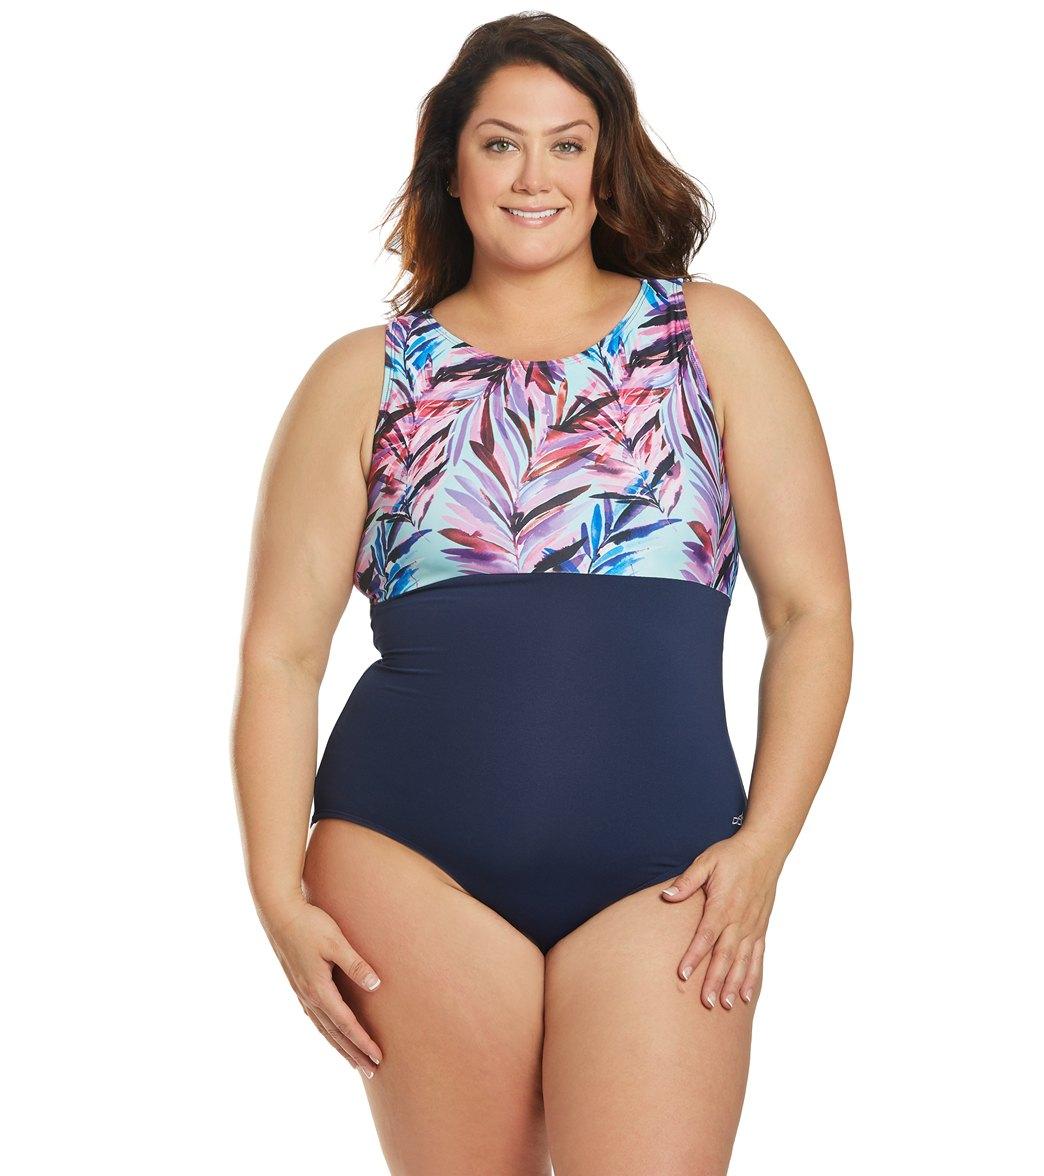 Dolfin Women's Plus Aquashape Wisteria Block High Neck Chlorine Resistant One Piece Swimsuit - Wysteria